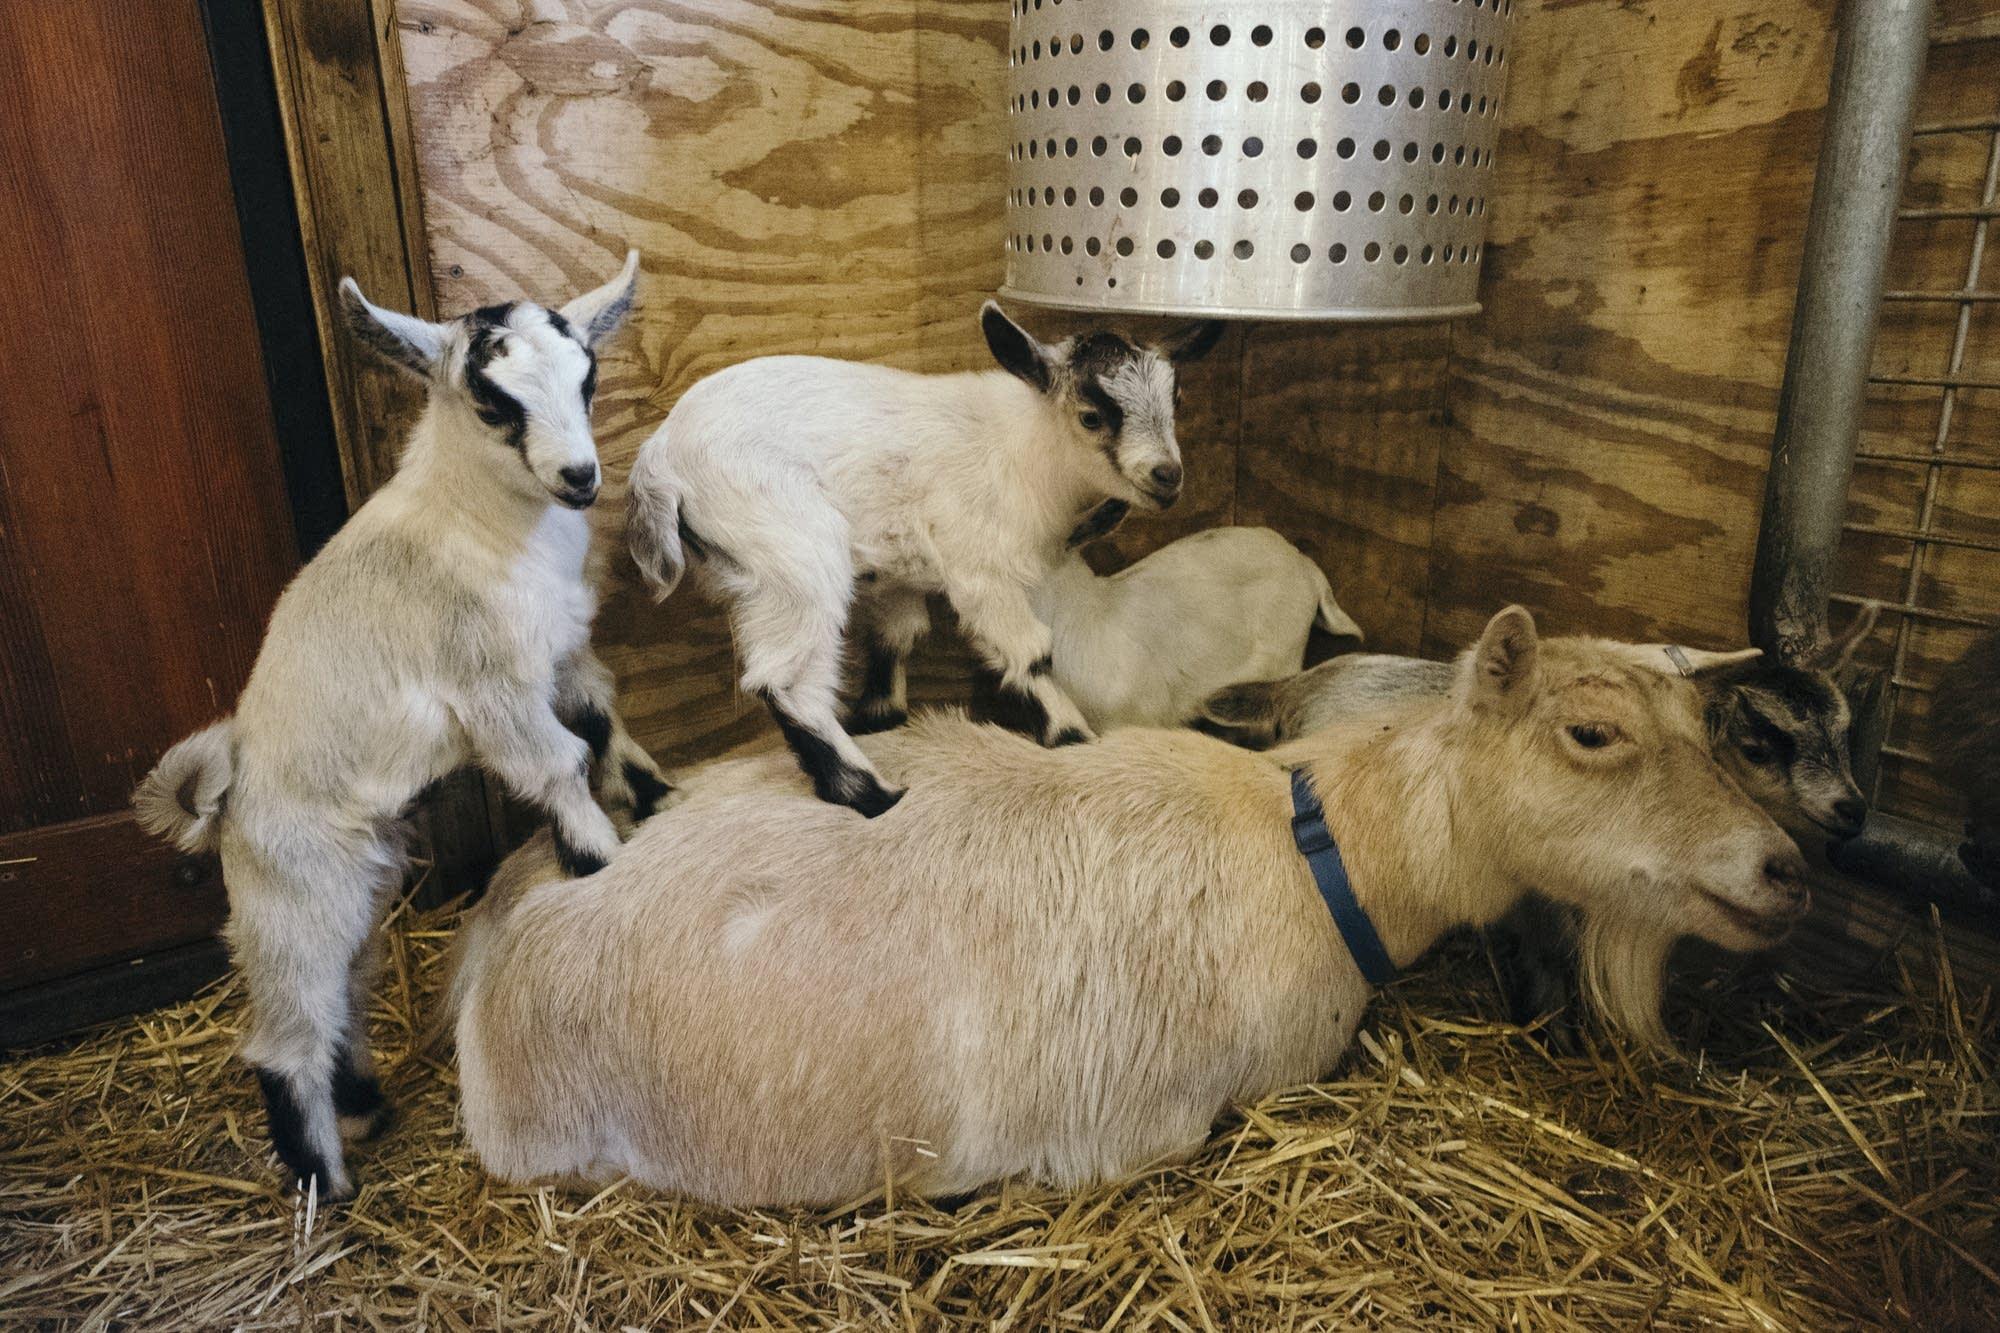 Hay Baby Newborn Farm Animals Make Their Zoo Debut